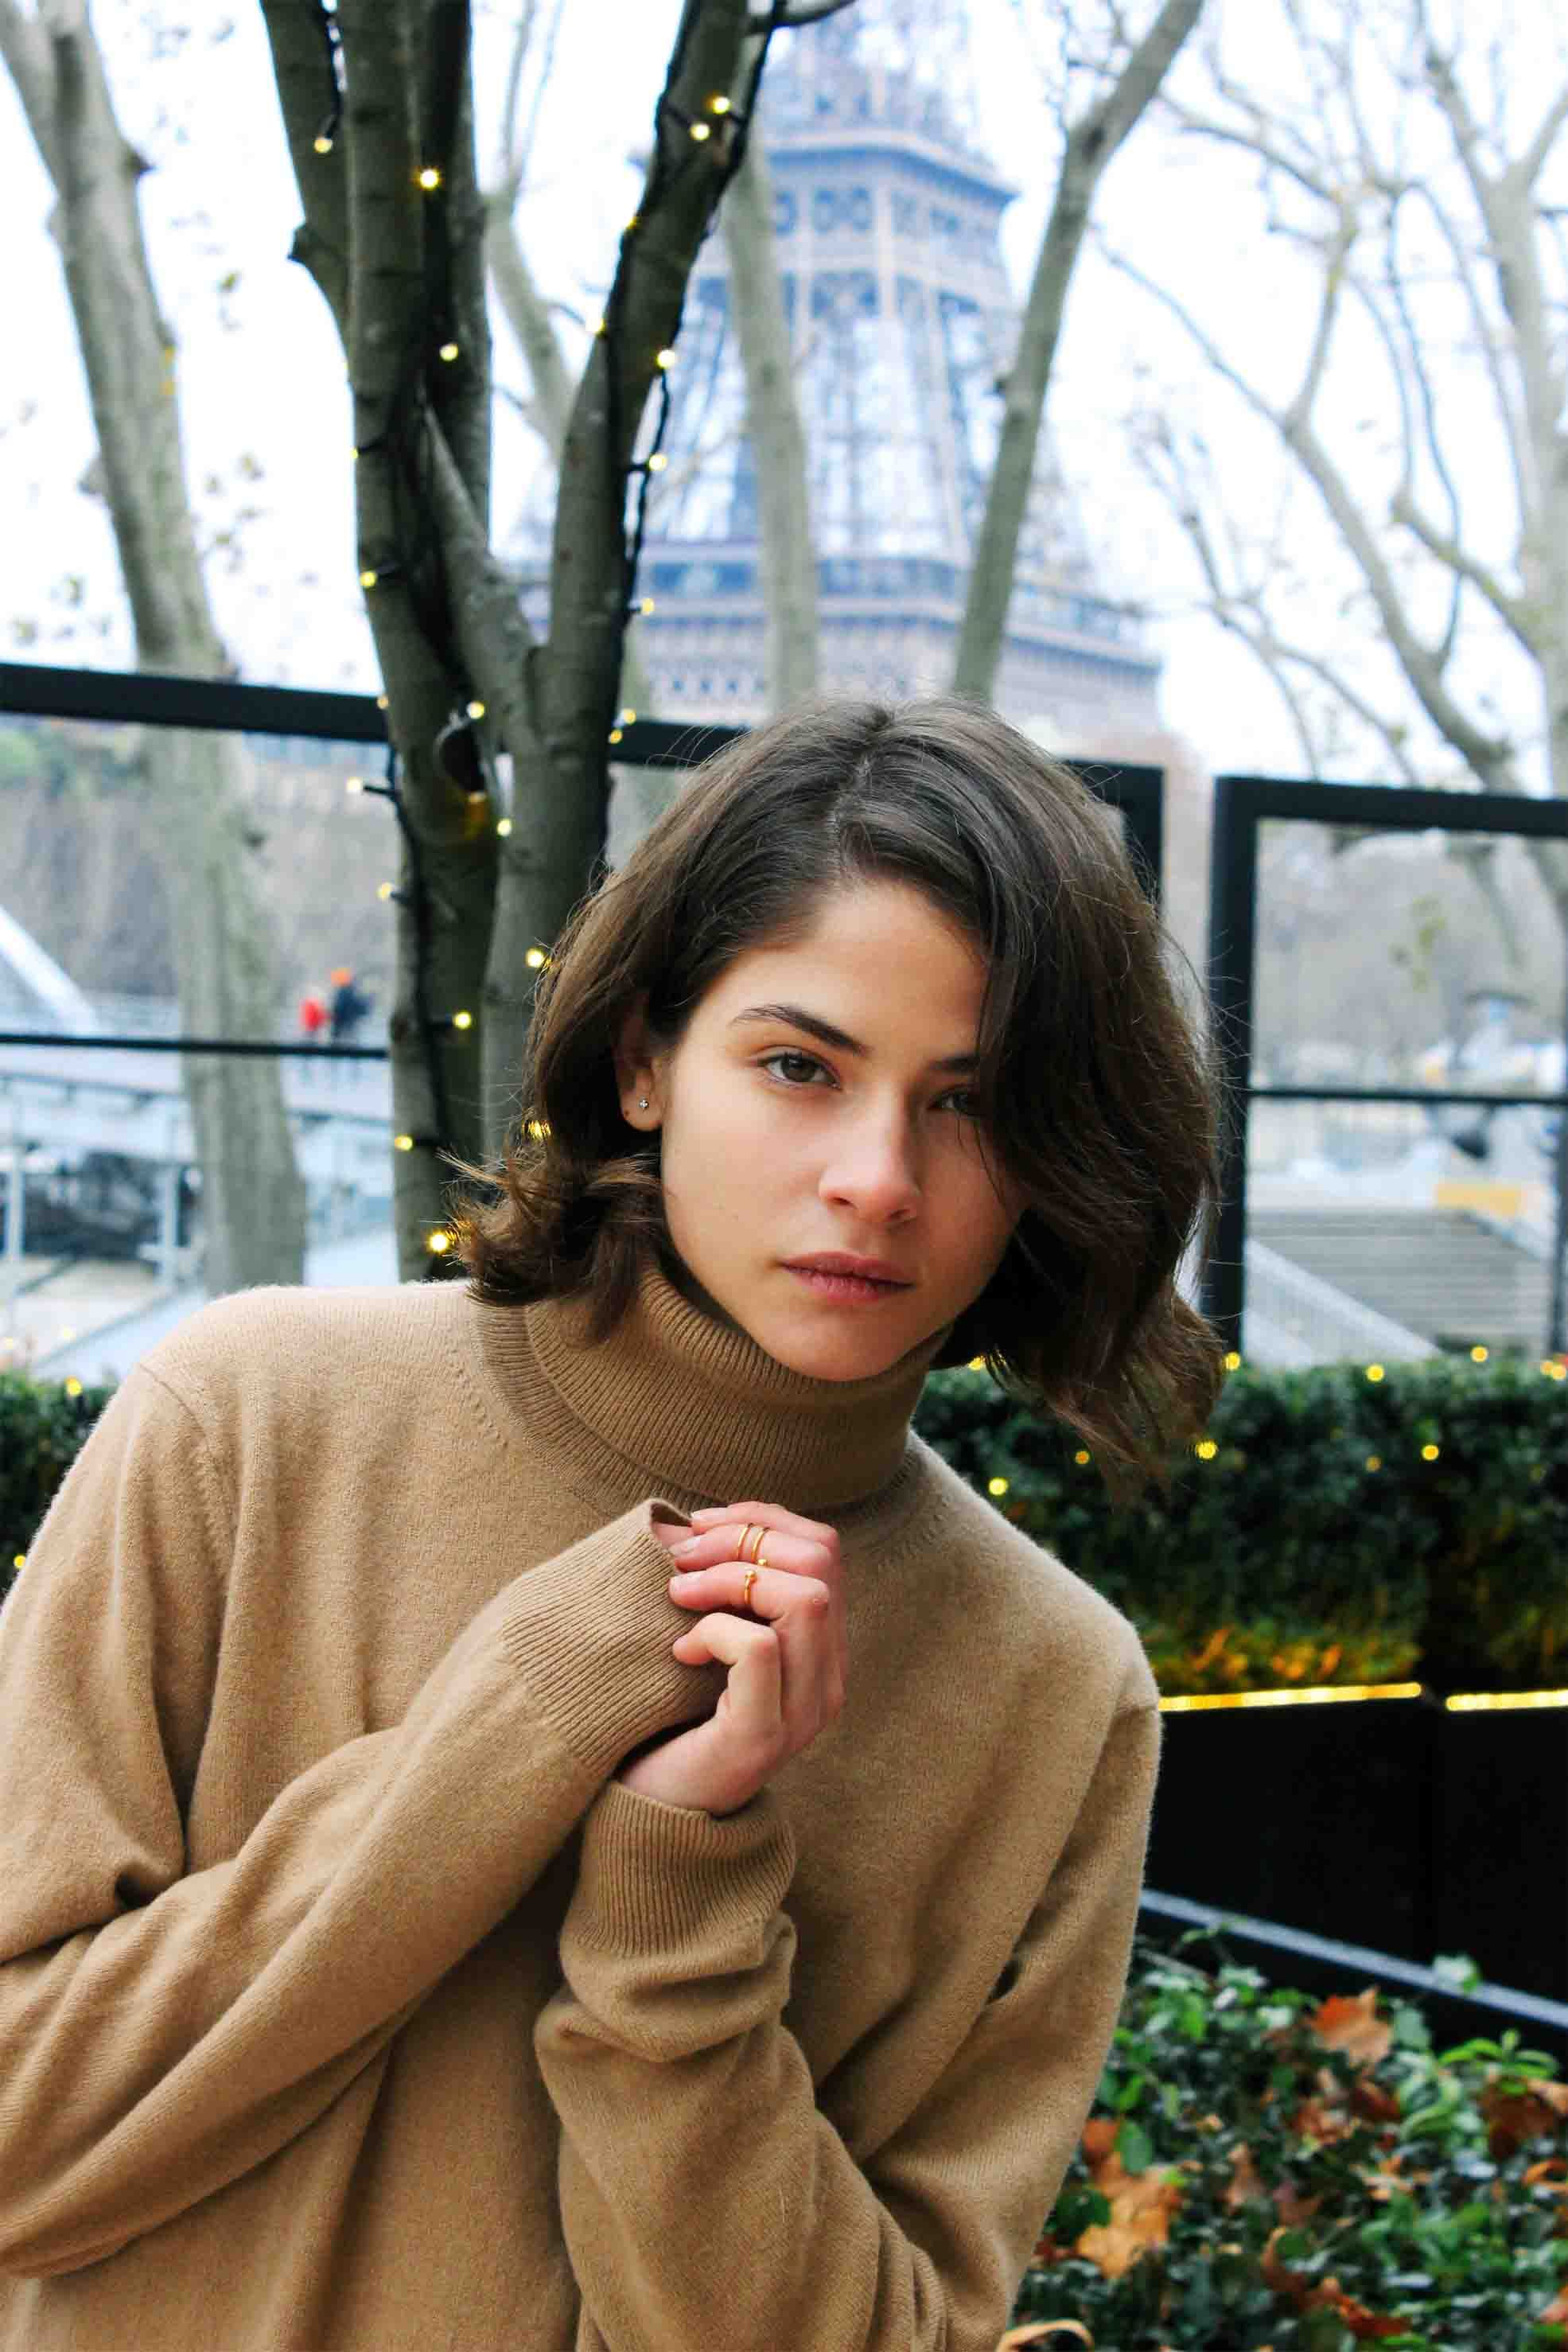 alba galocha - Buscar con Google | beau | Hair cuts, Short ...